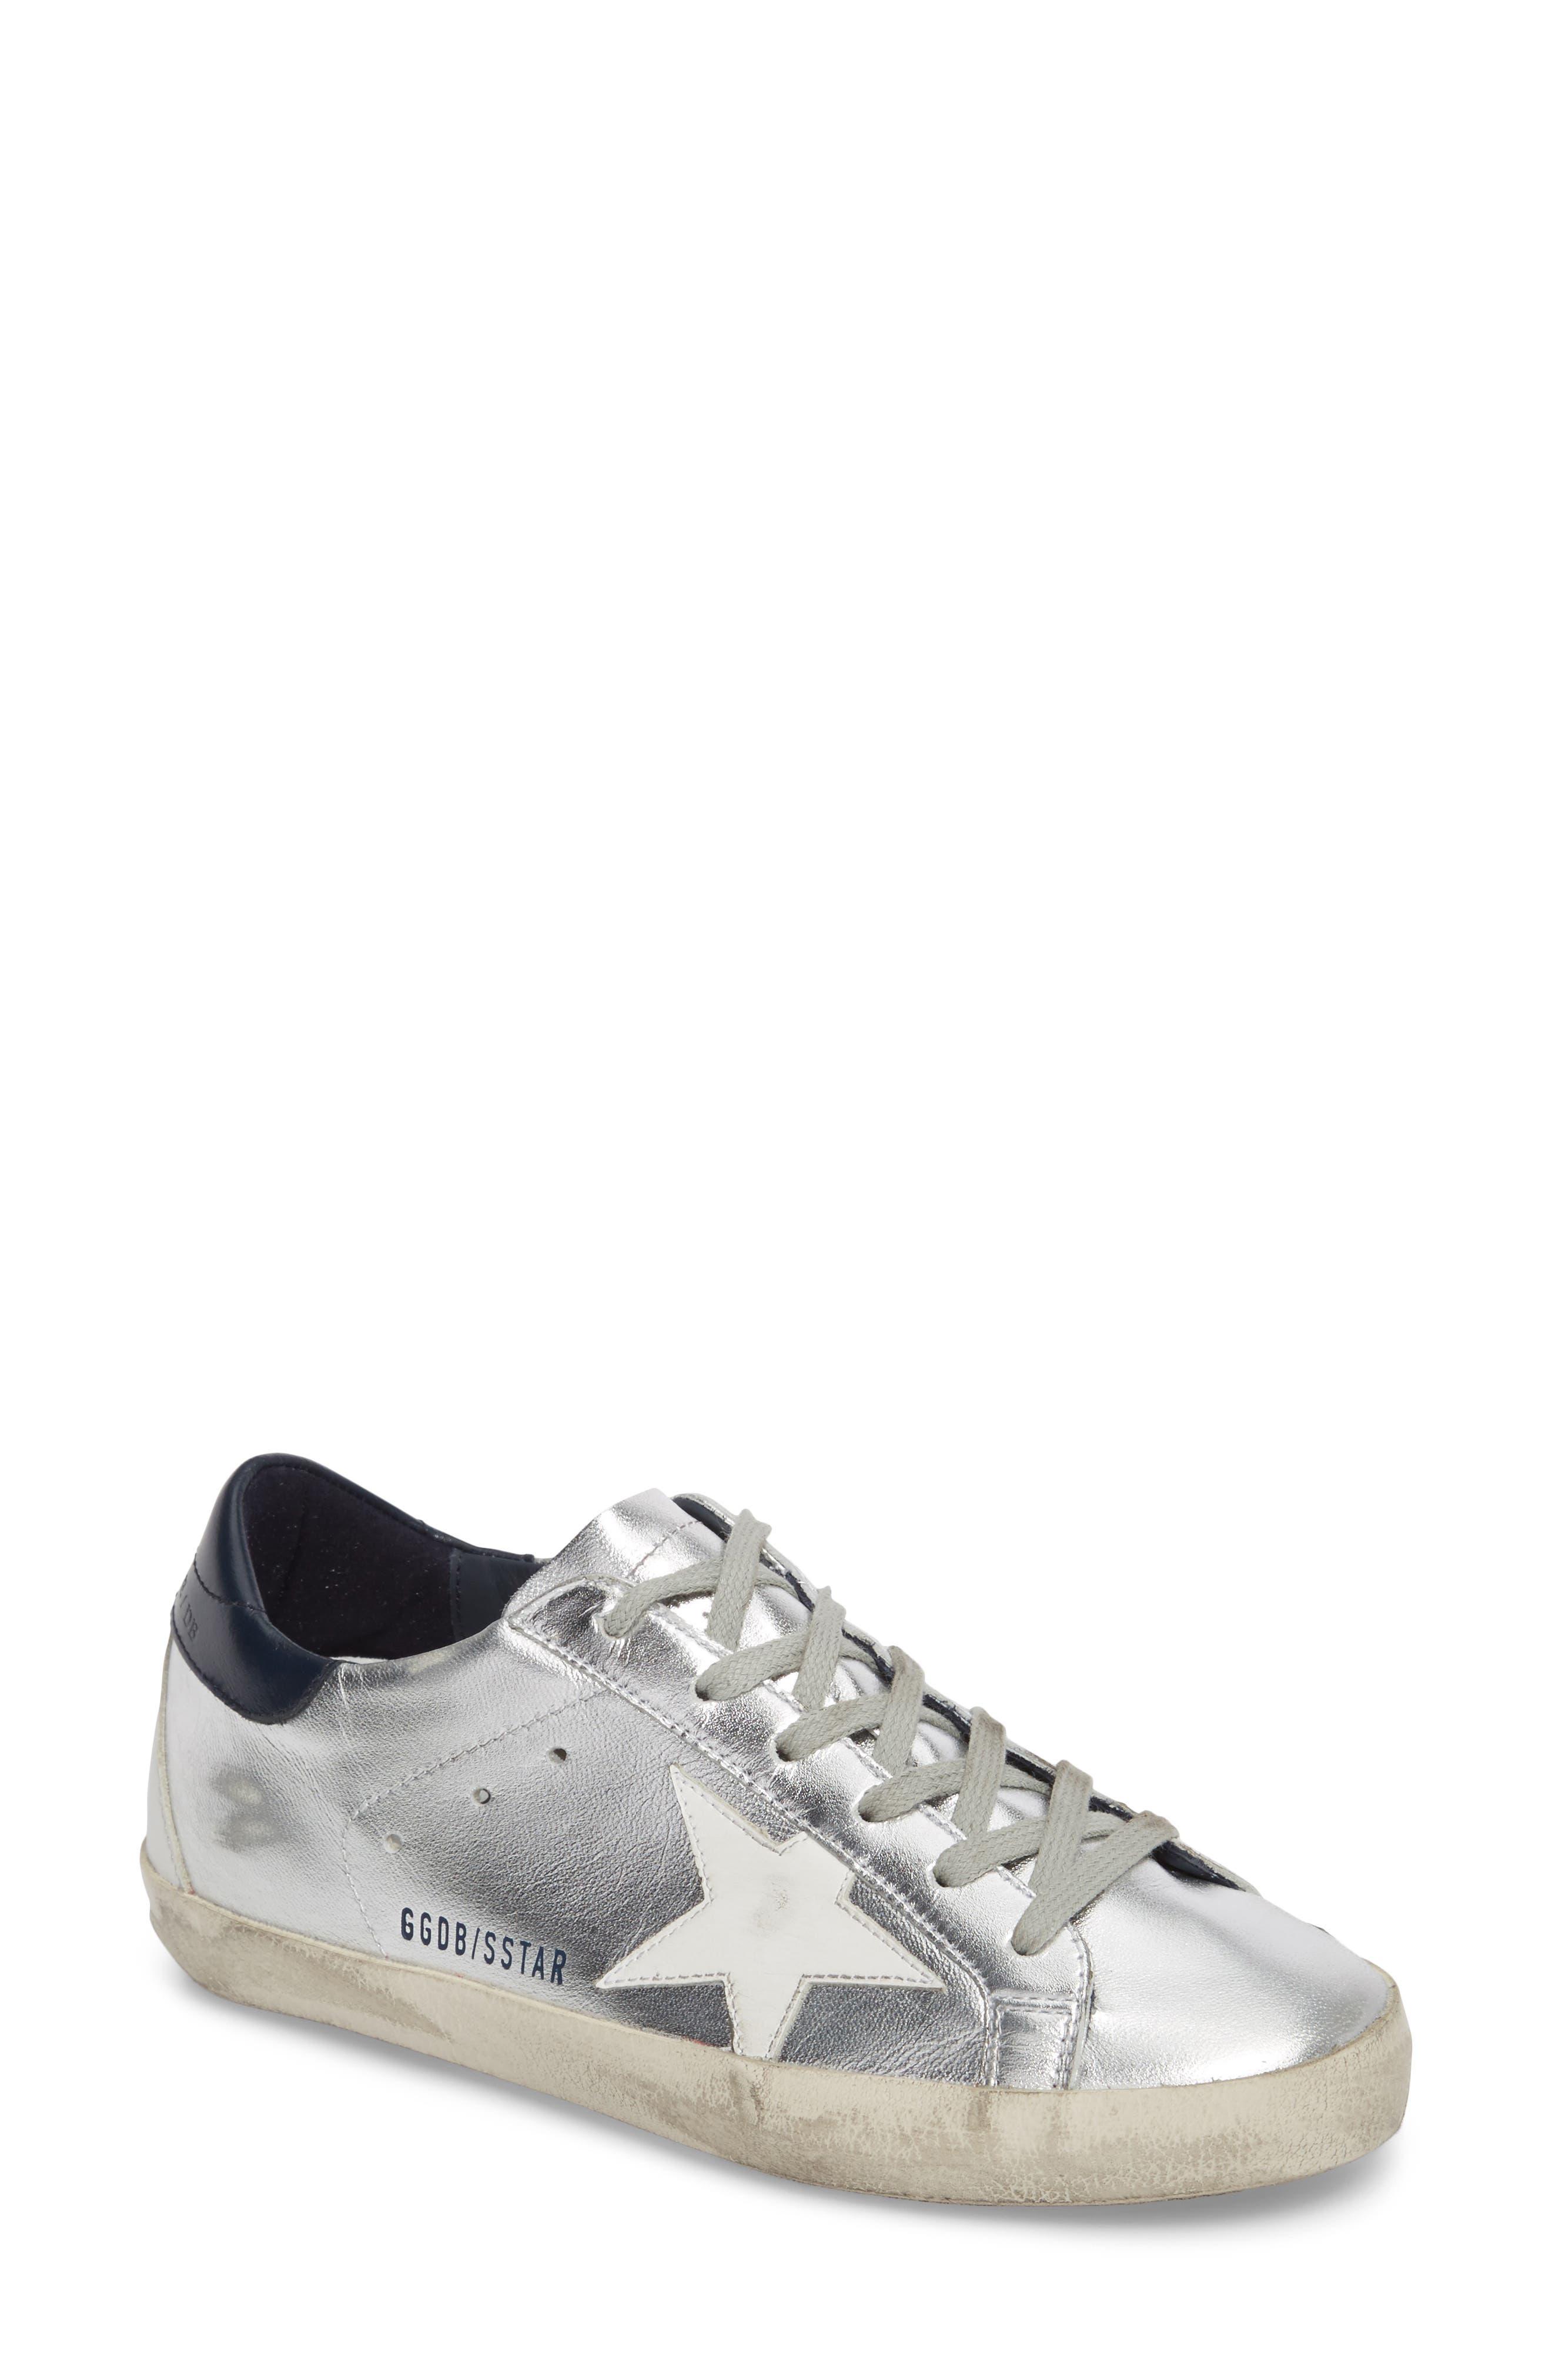 Superstar Metallic Low Top Sneaker,                         Main,                         color, Silver